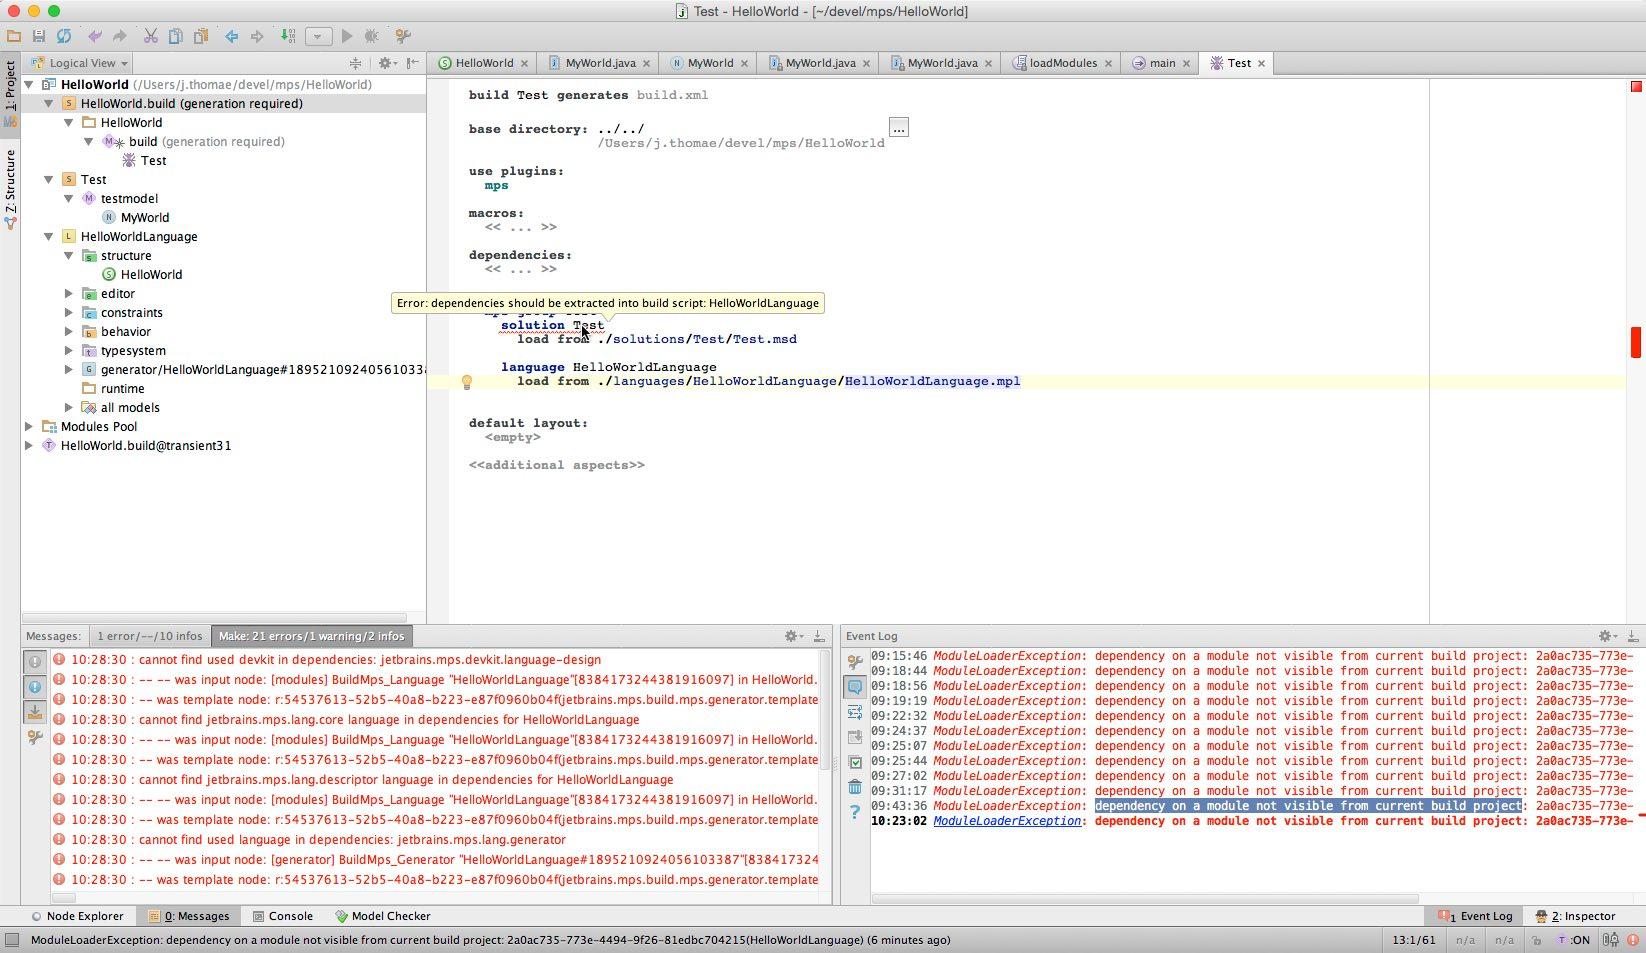 dependencies_should_be_extracted.jpg